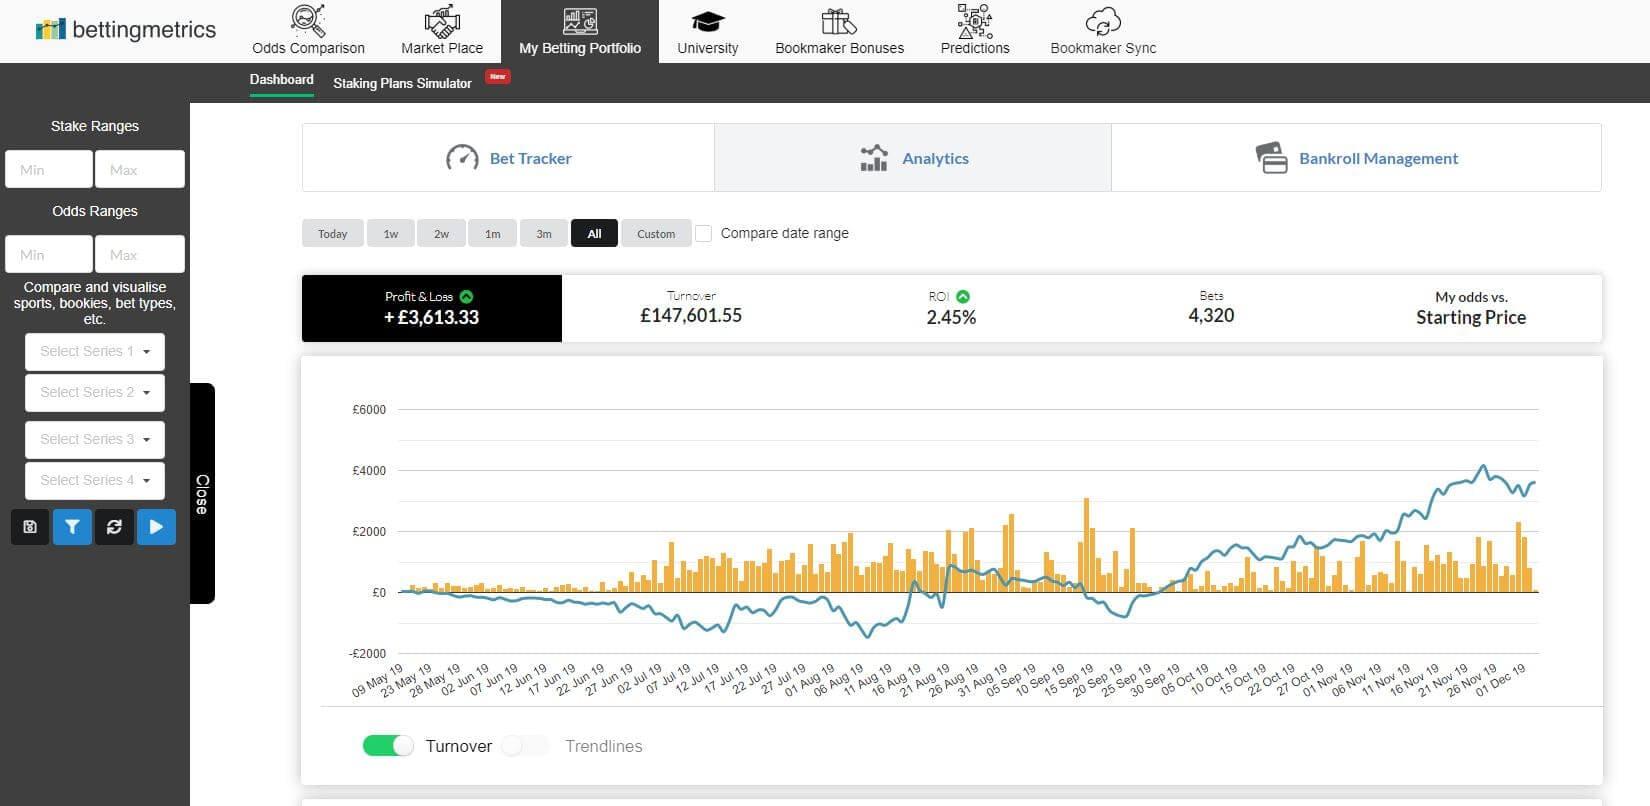 Bet Journal week 28 - performance update